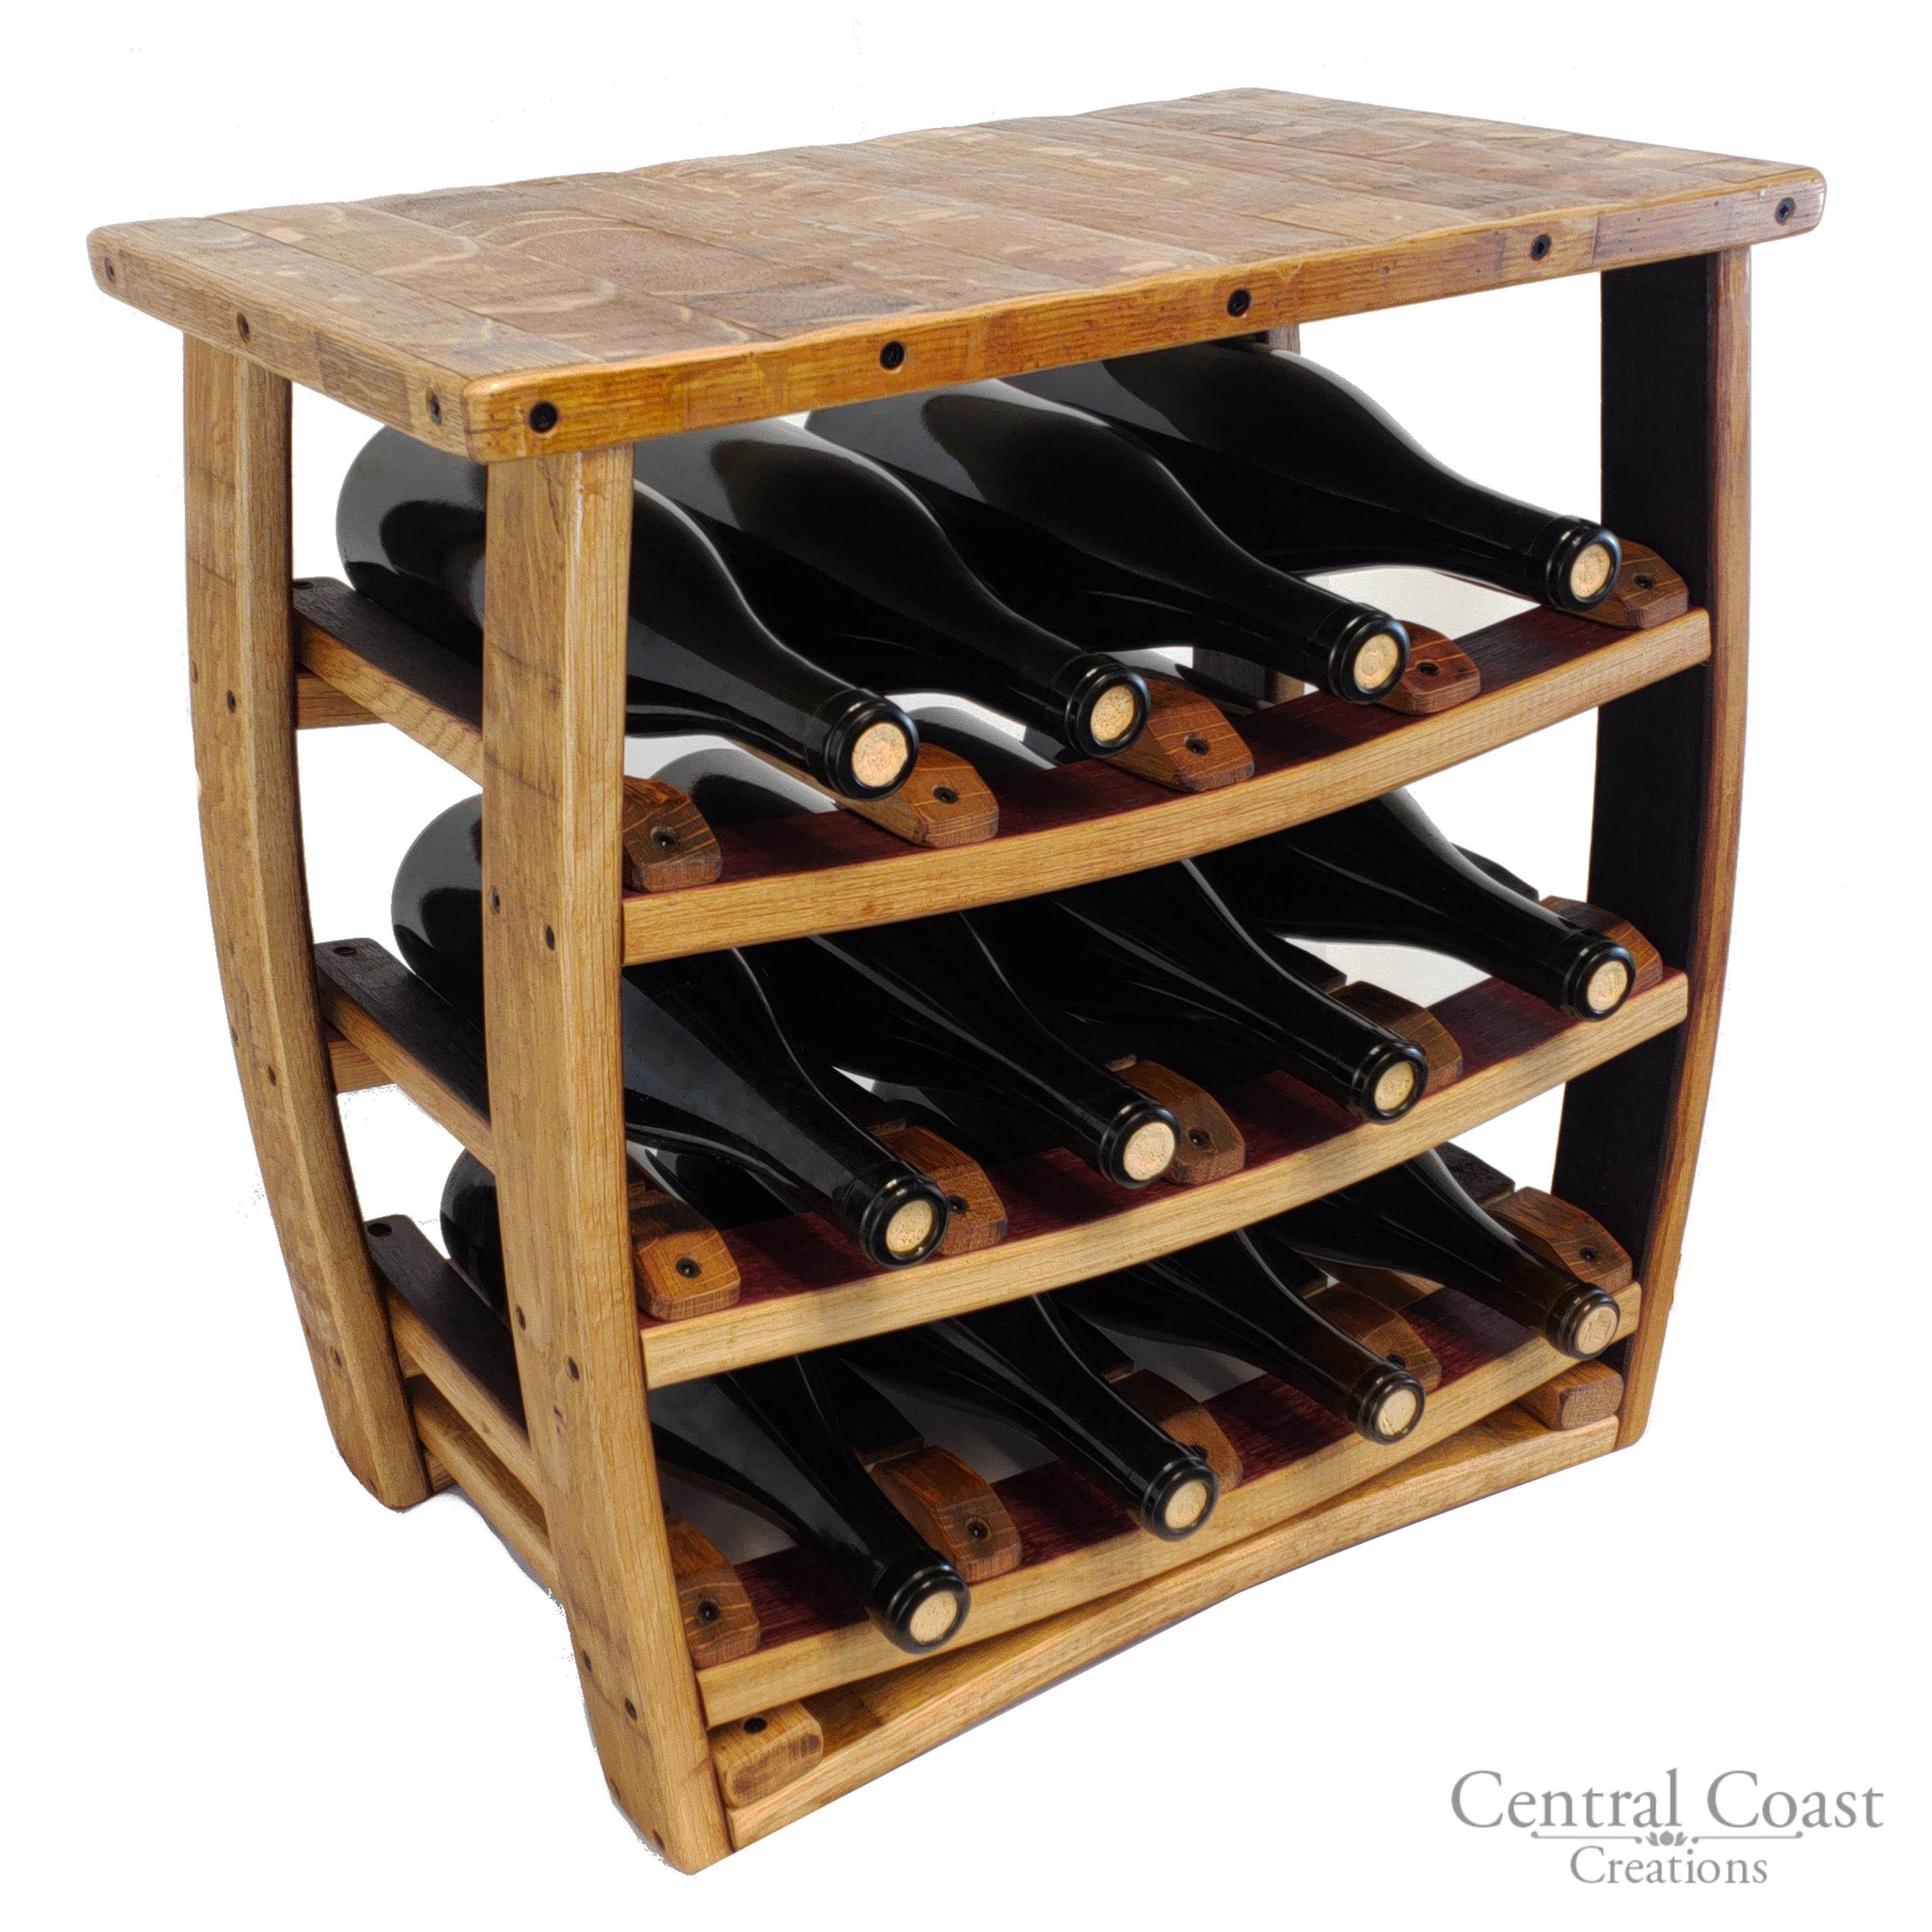 Table Top Wine Barrel Wine Rack Rustic Furniture 12 Bottle ...